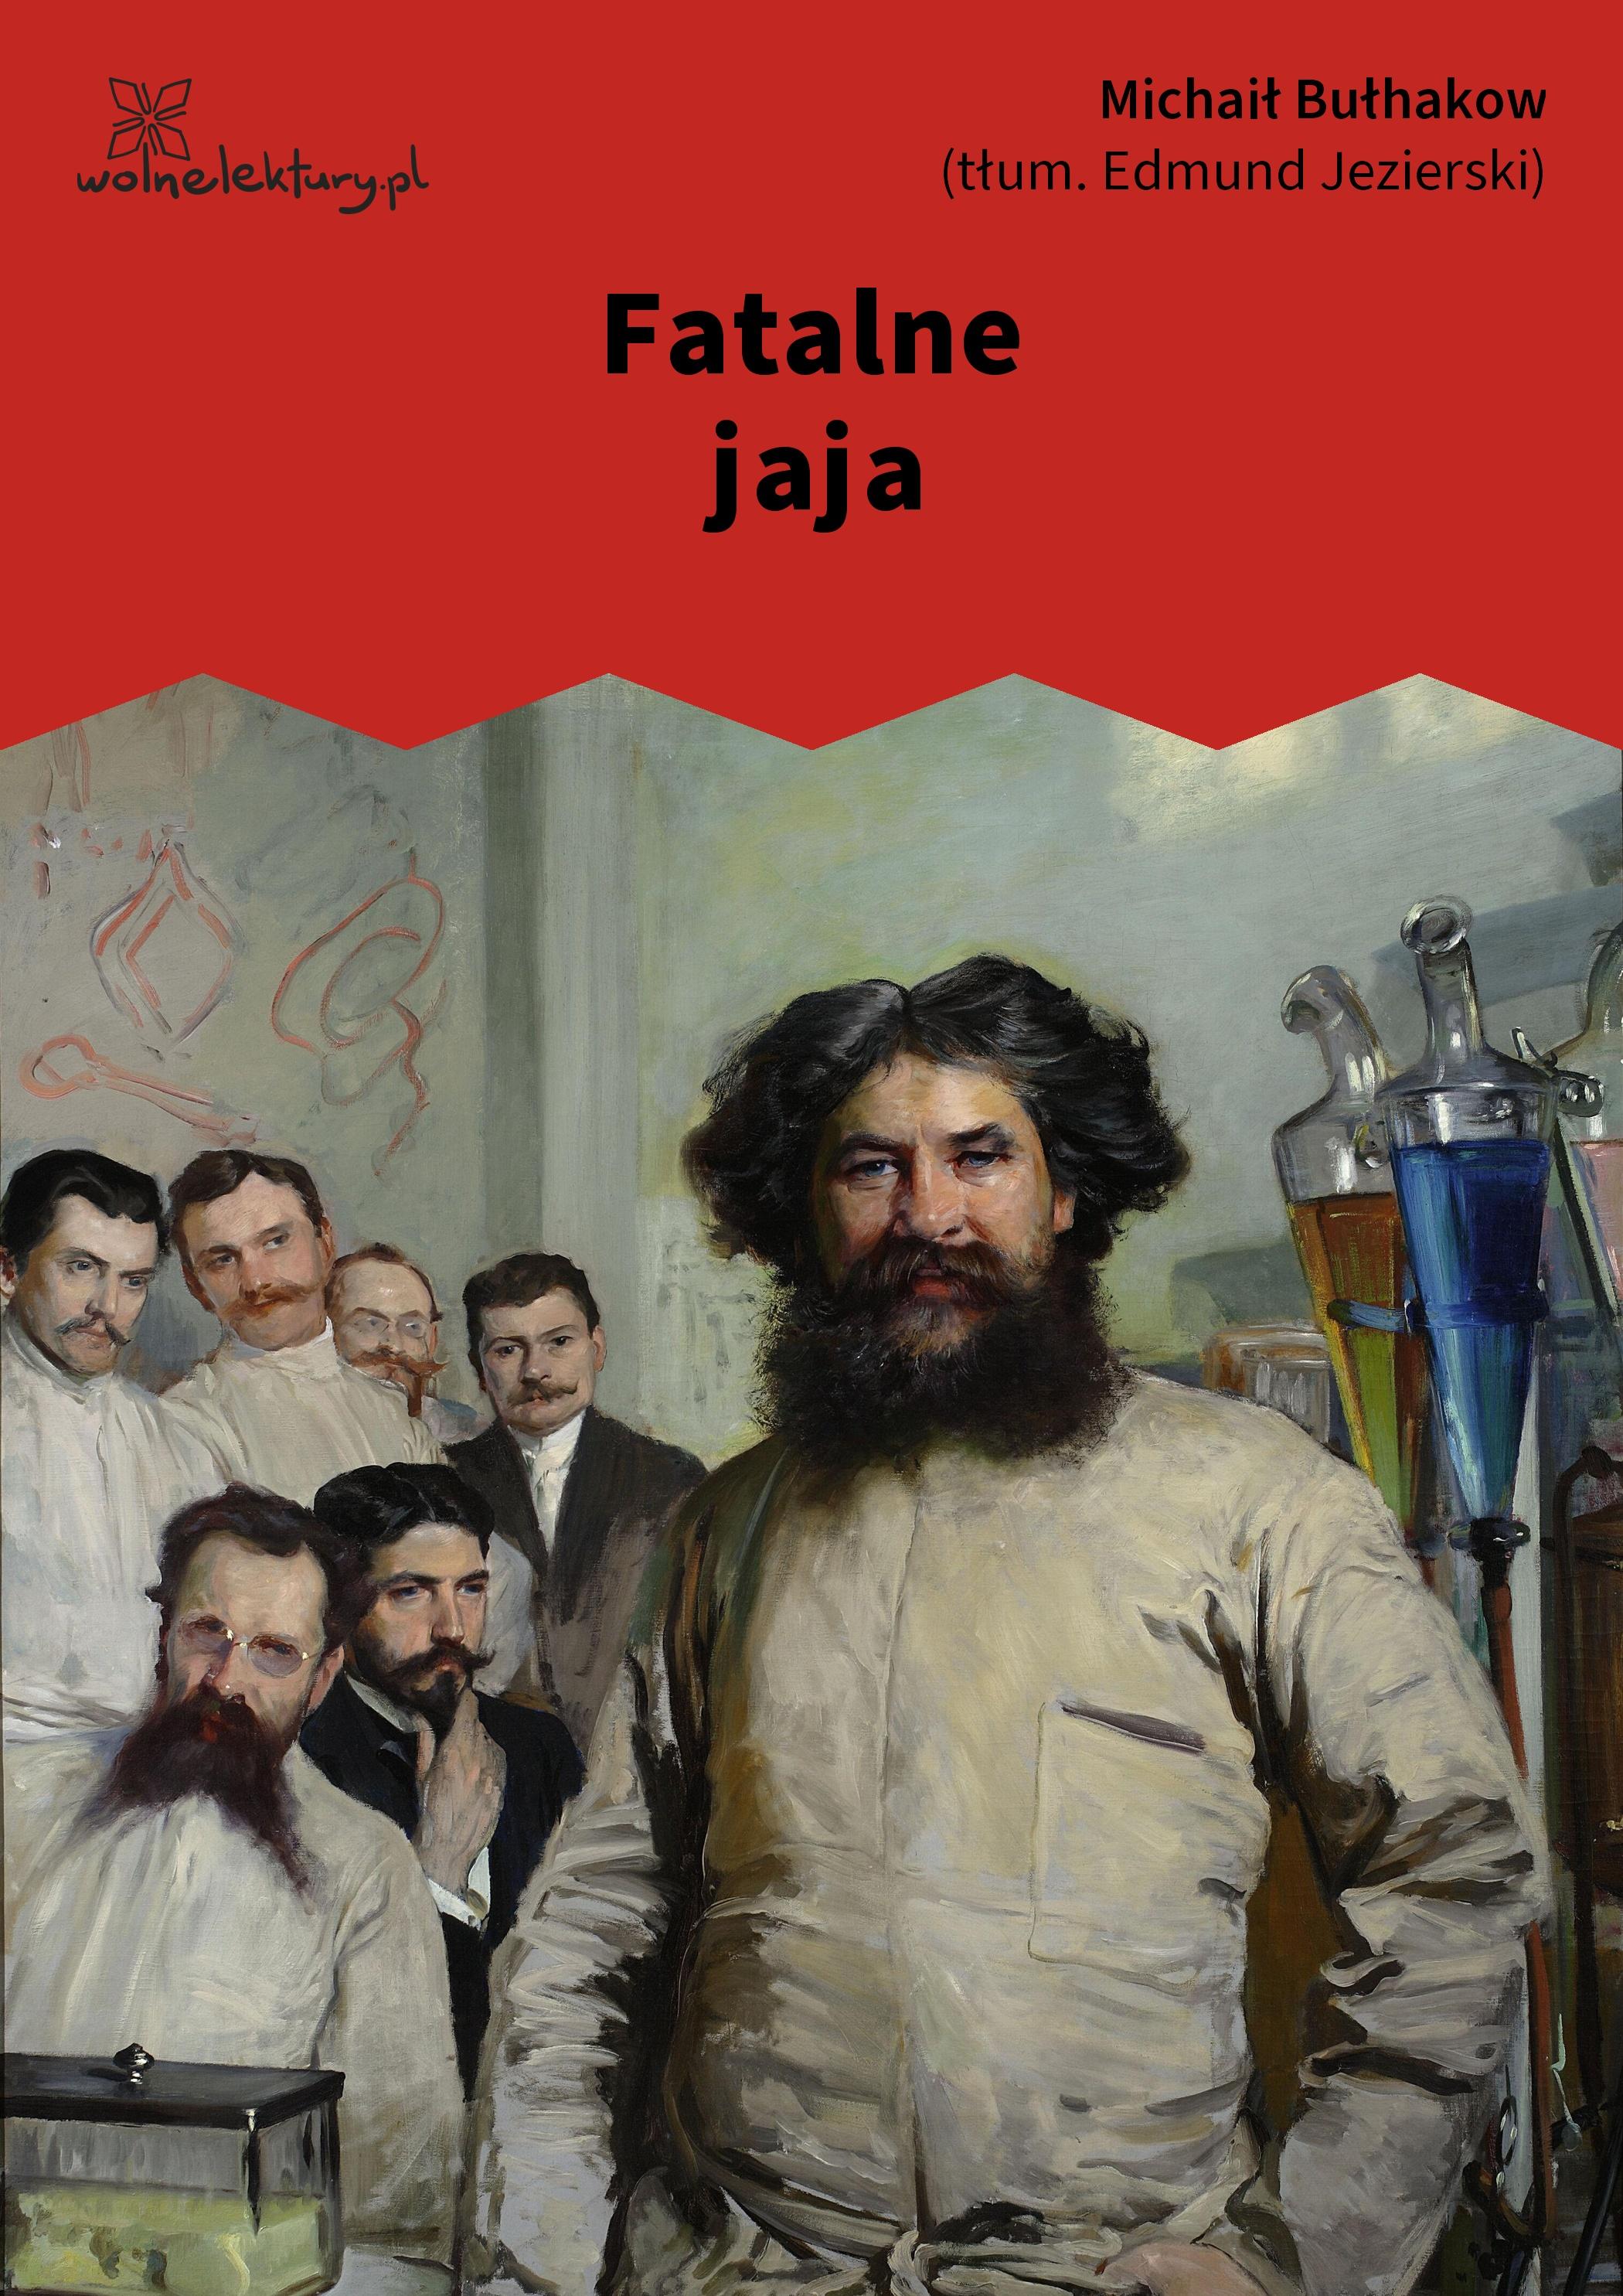 edgar allan poe books pdf download